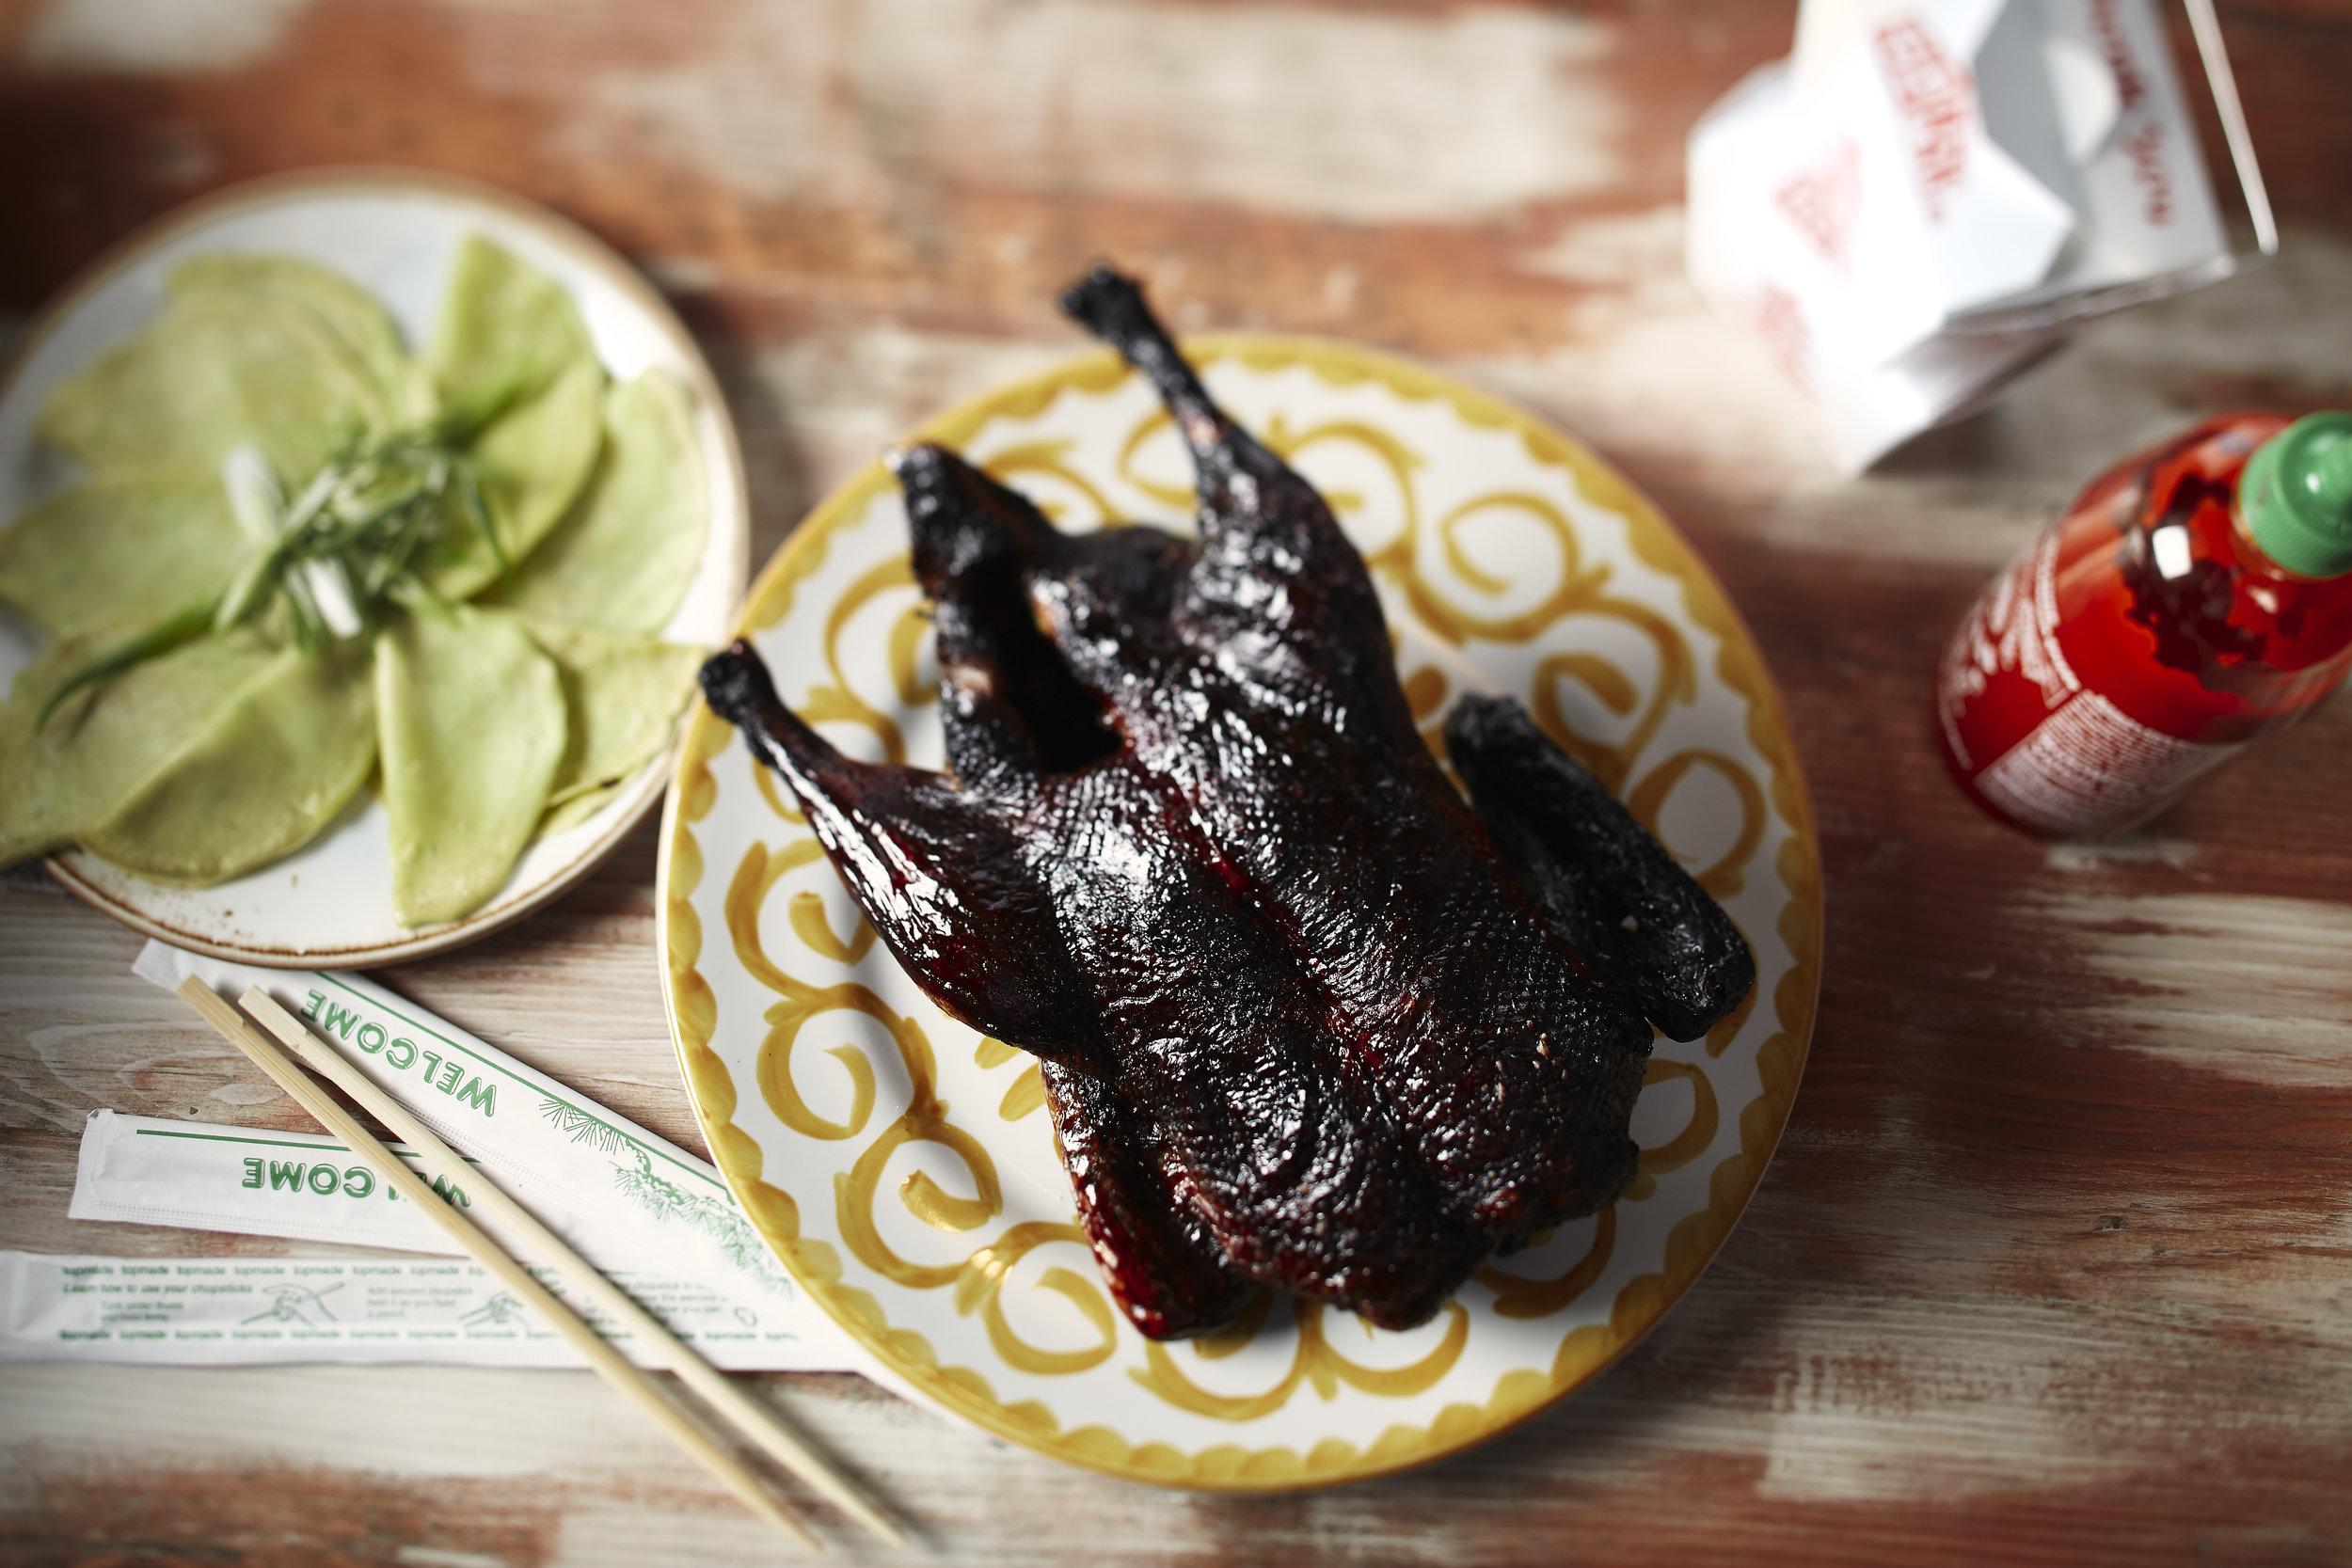 Toque Agency: The Merchant Kitchen, Winnipeg, Blackened Whole Roasted Chicken.